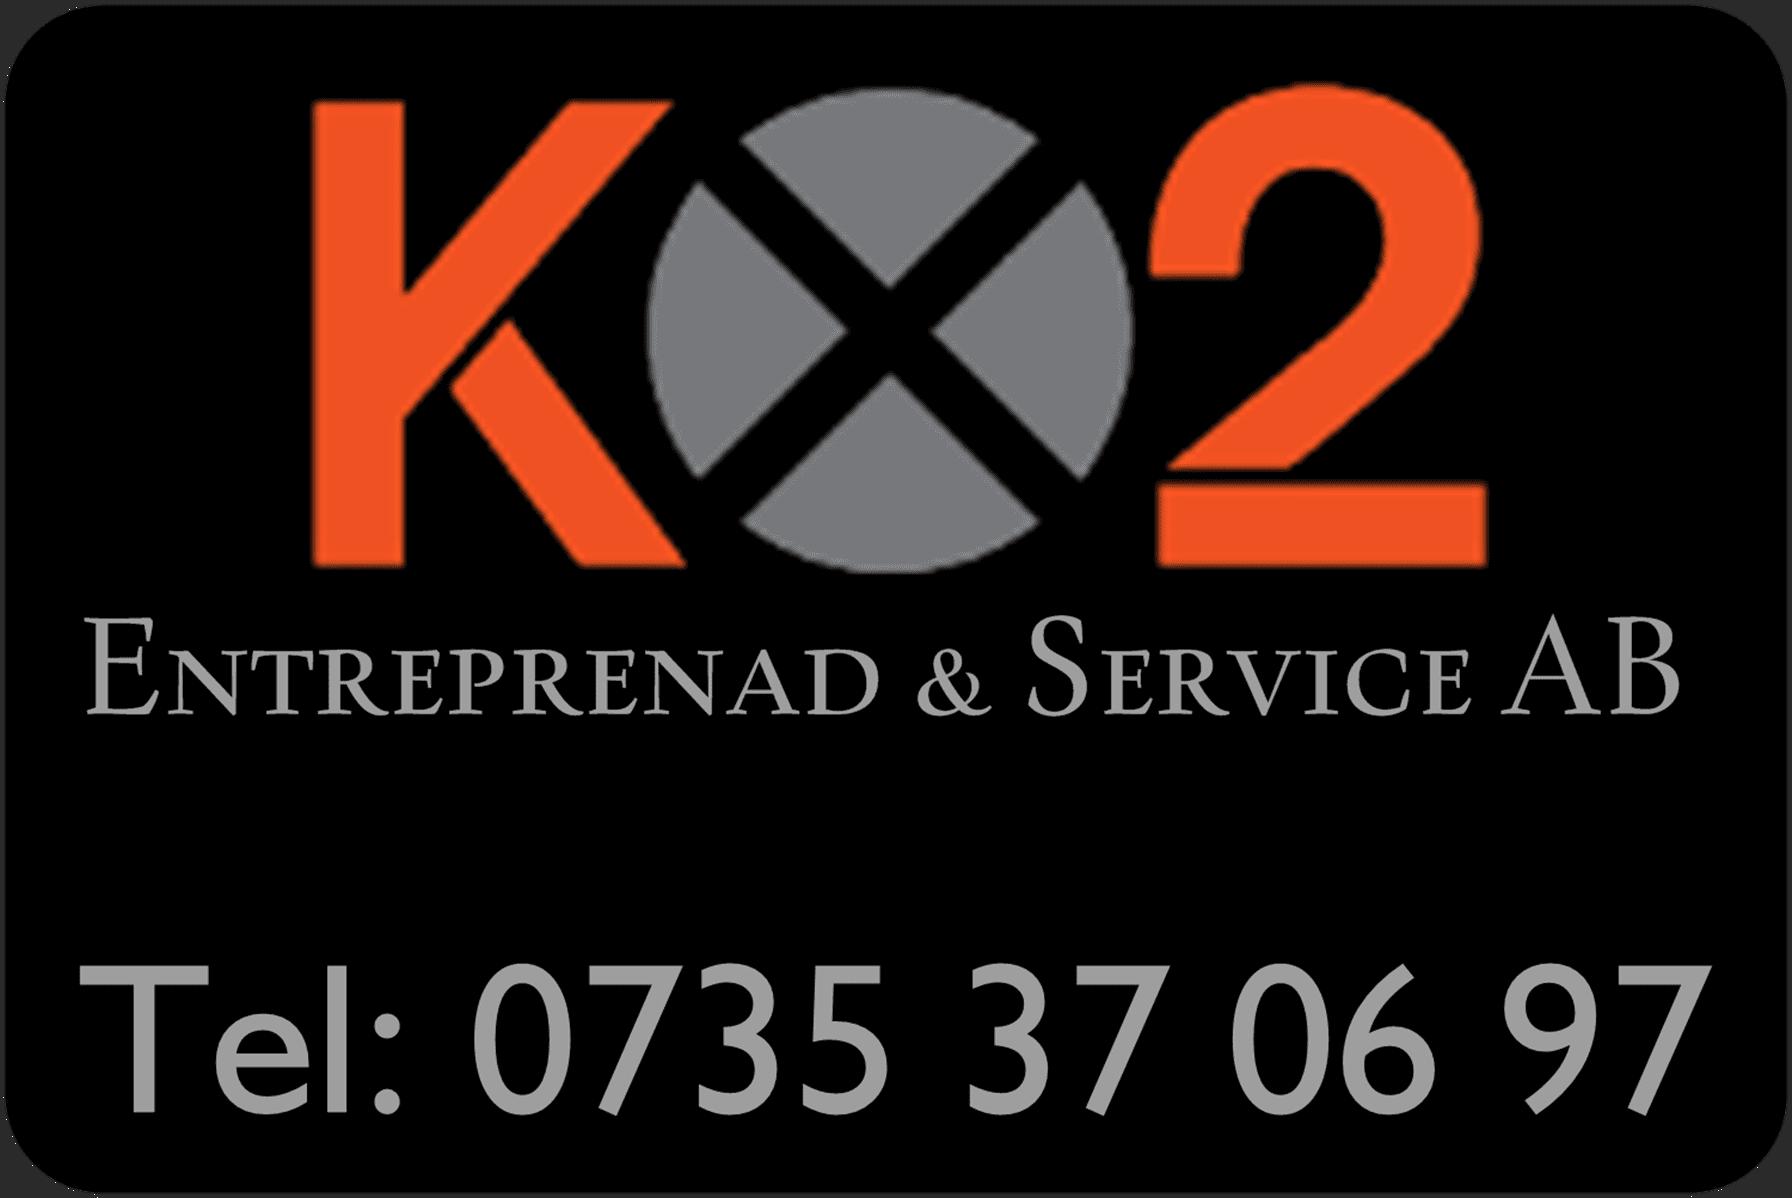 Logotyp för Kx2 Entreprenad & Service AB